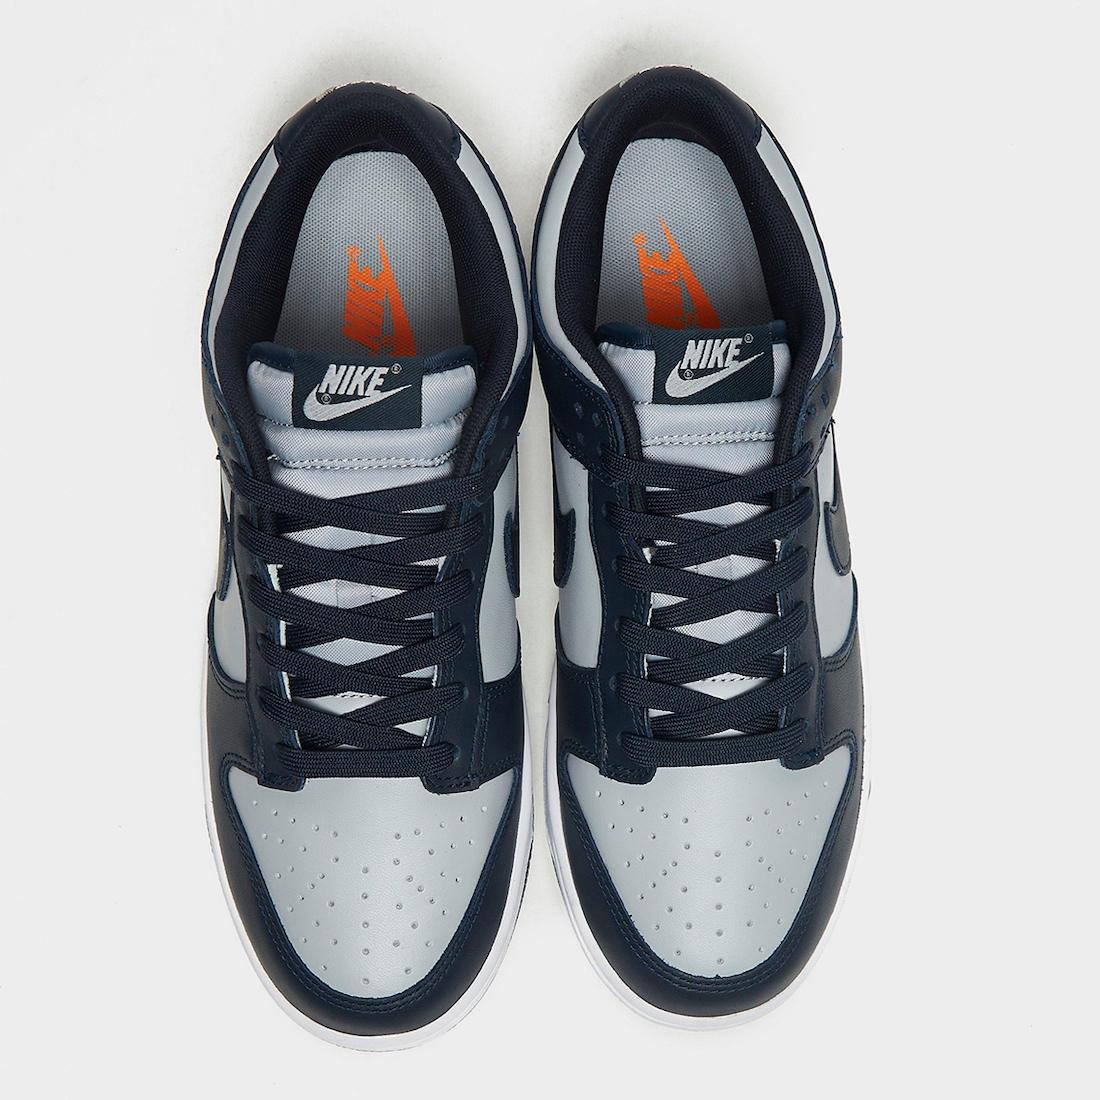 Nike Dunk Low ''Georgetown'' - CW1590-004